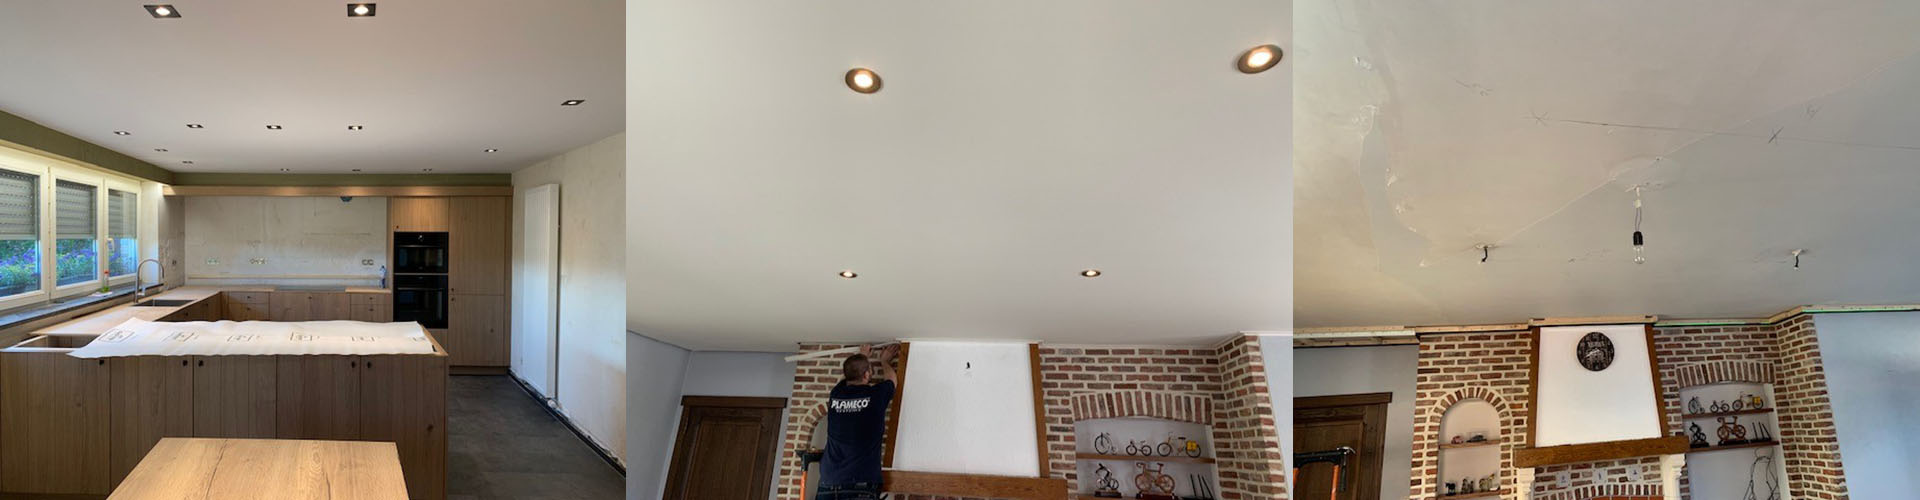 spanplafond01